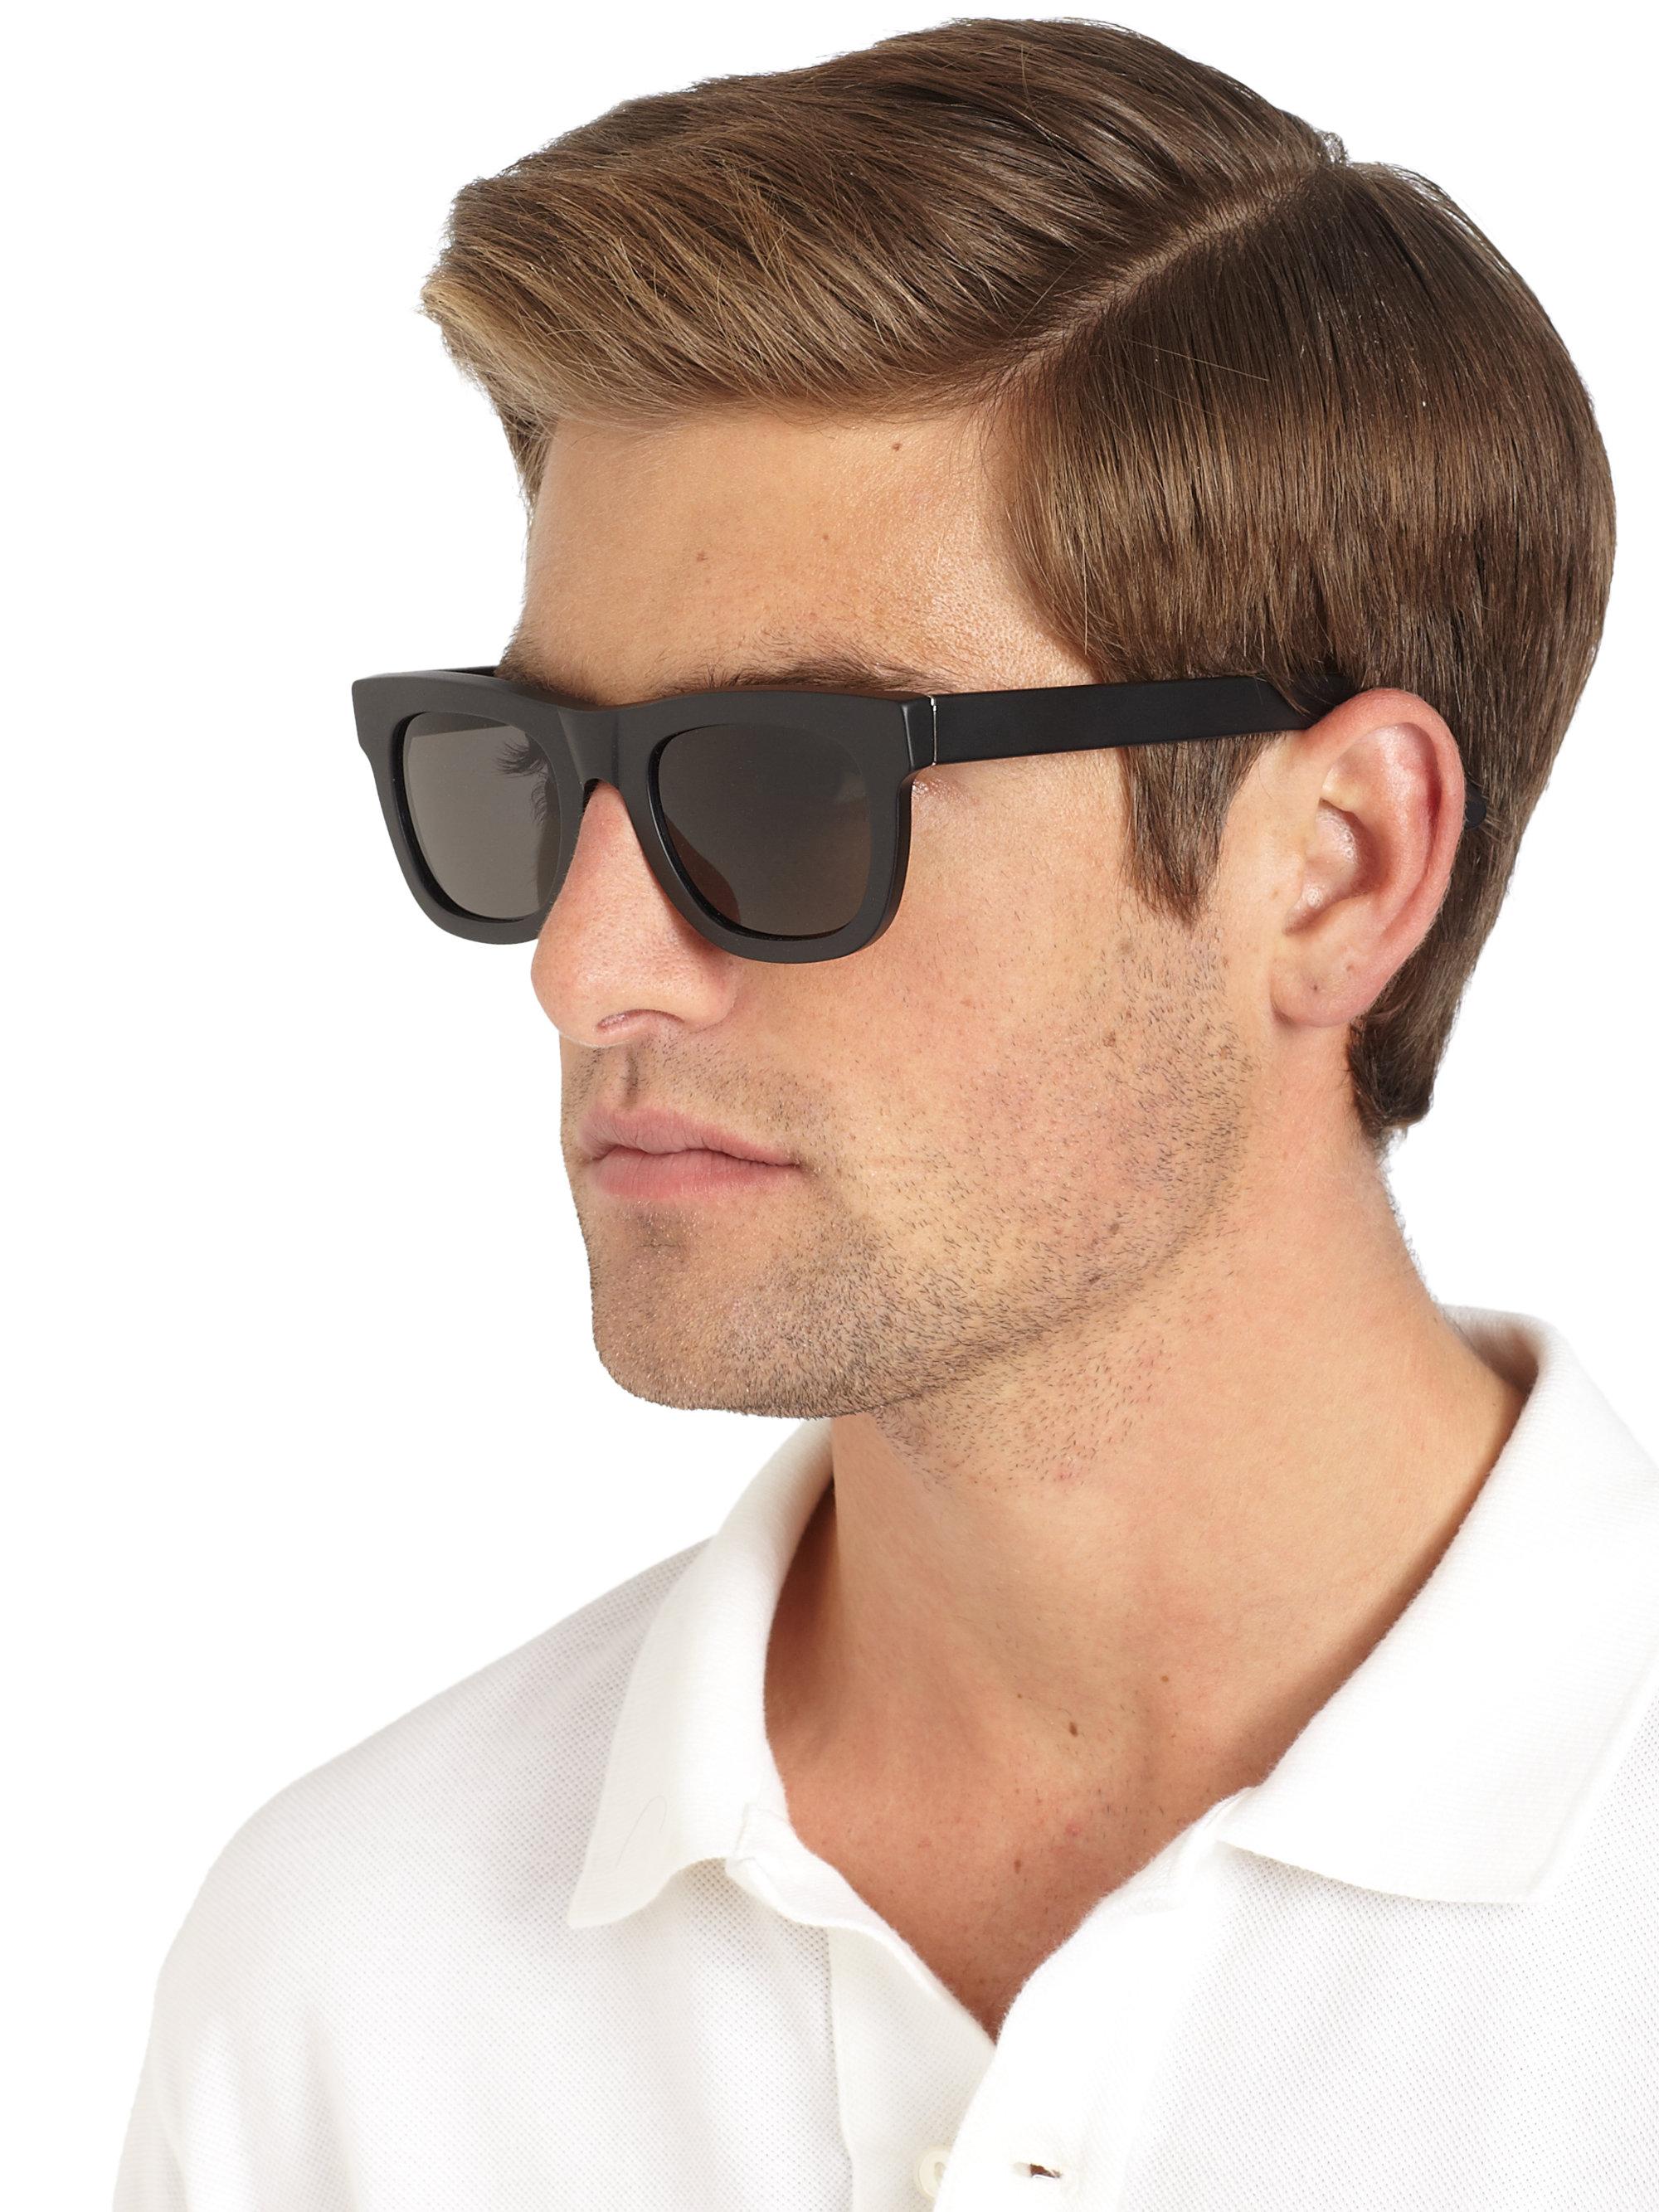 79478ebba2a2 Retrosuperfuture Matte Wayfarer Sunglasses in Black for Men - Lyst